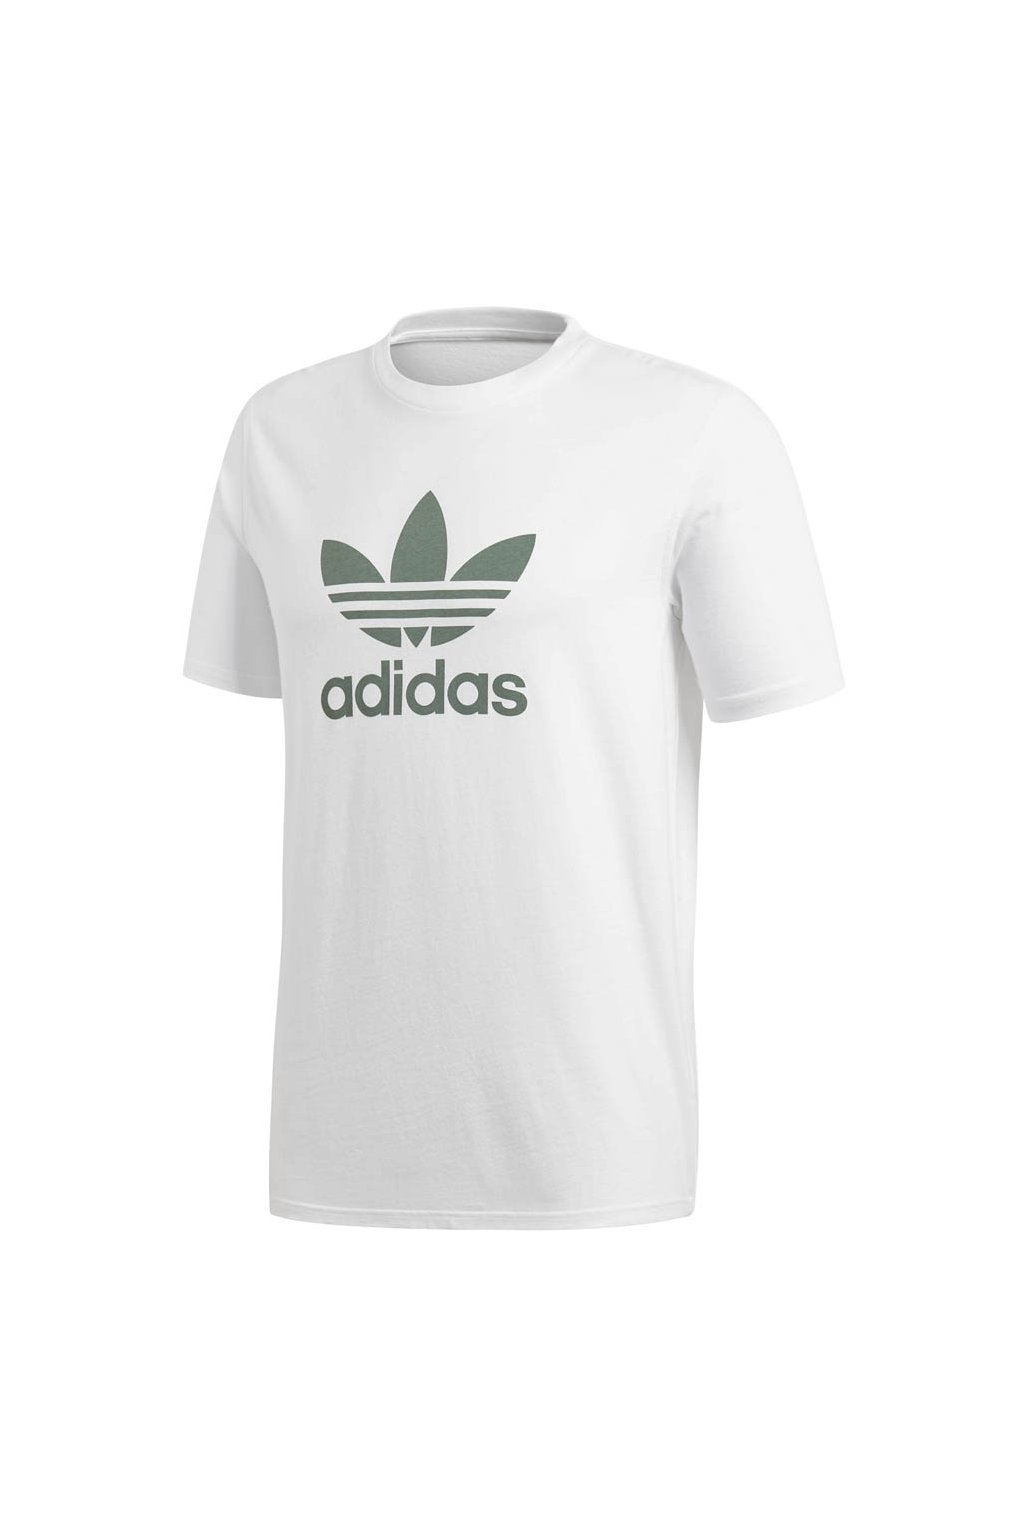 Pánske tričko Adidas Trefoil DH5773 biele